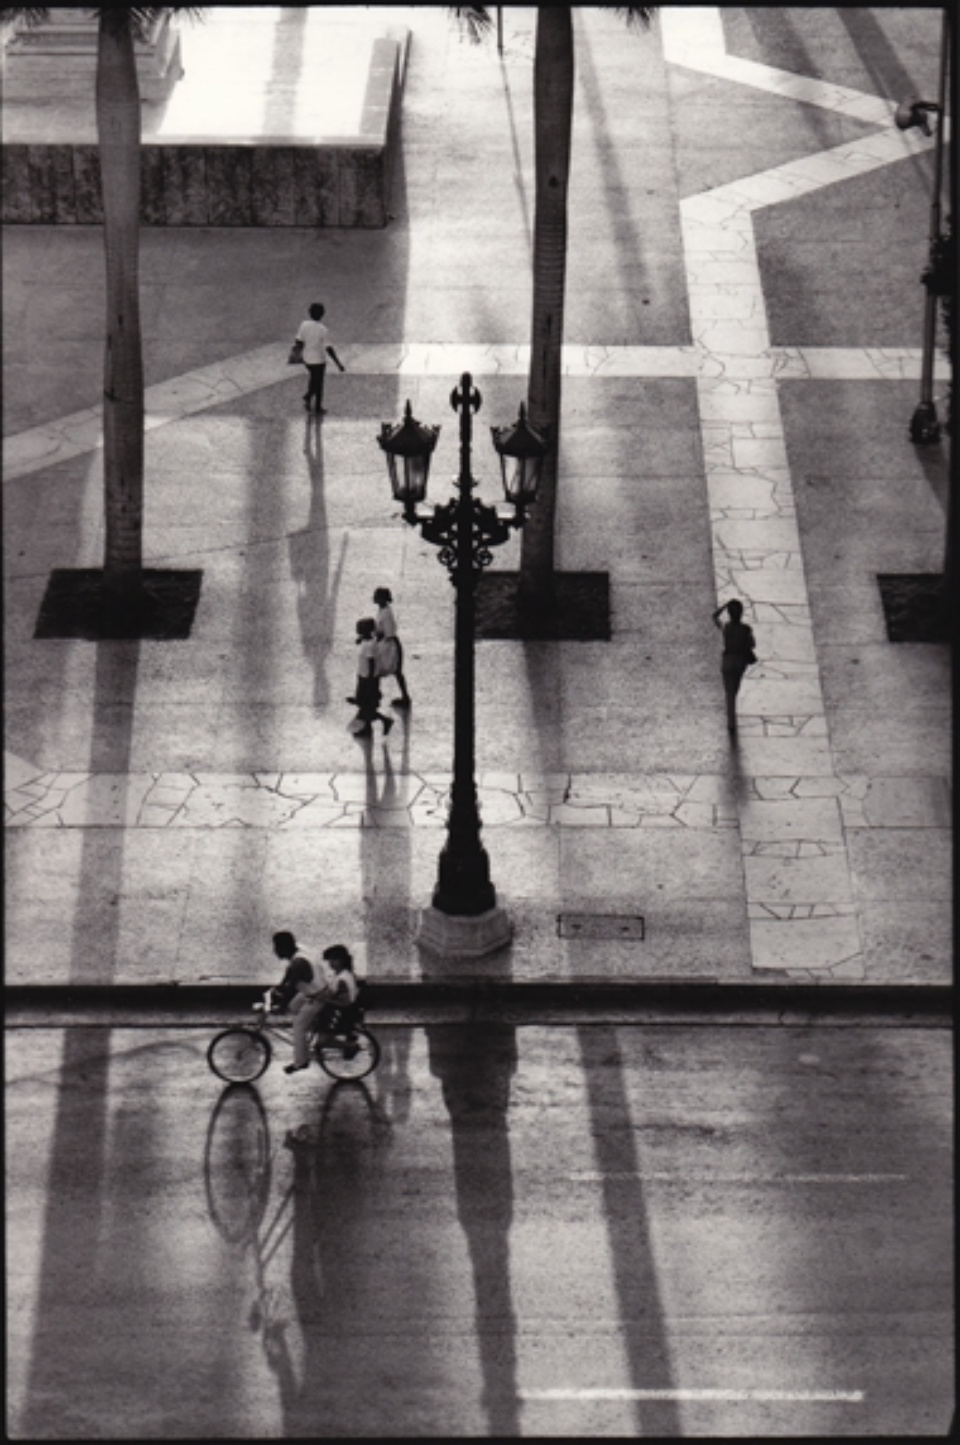 René Burri Plaza José Marti Havana, Kuba, 1993 Signed, titled and dated on verso Gelatin silver print, printed later